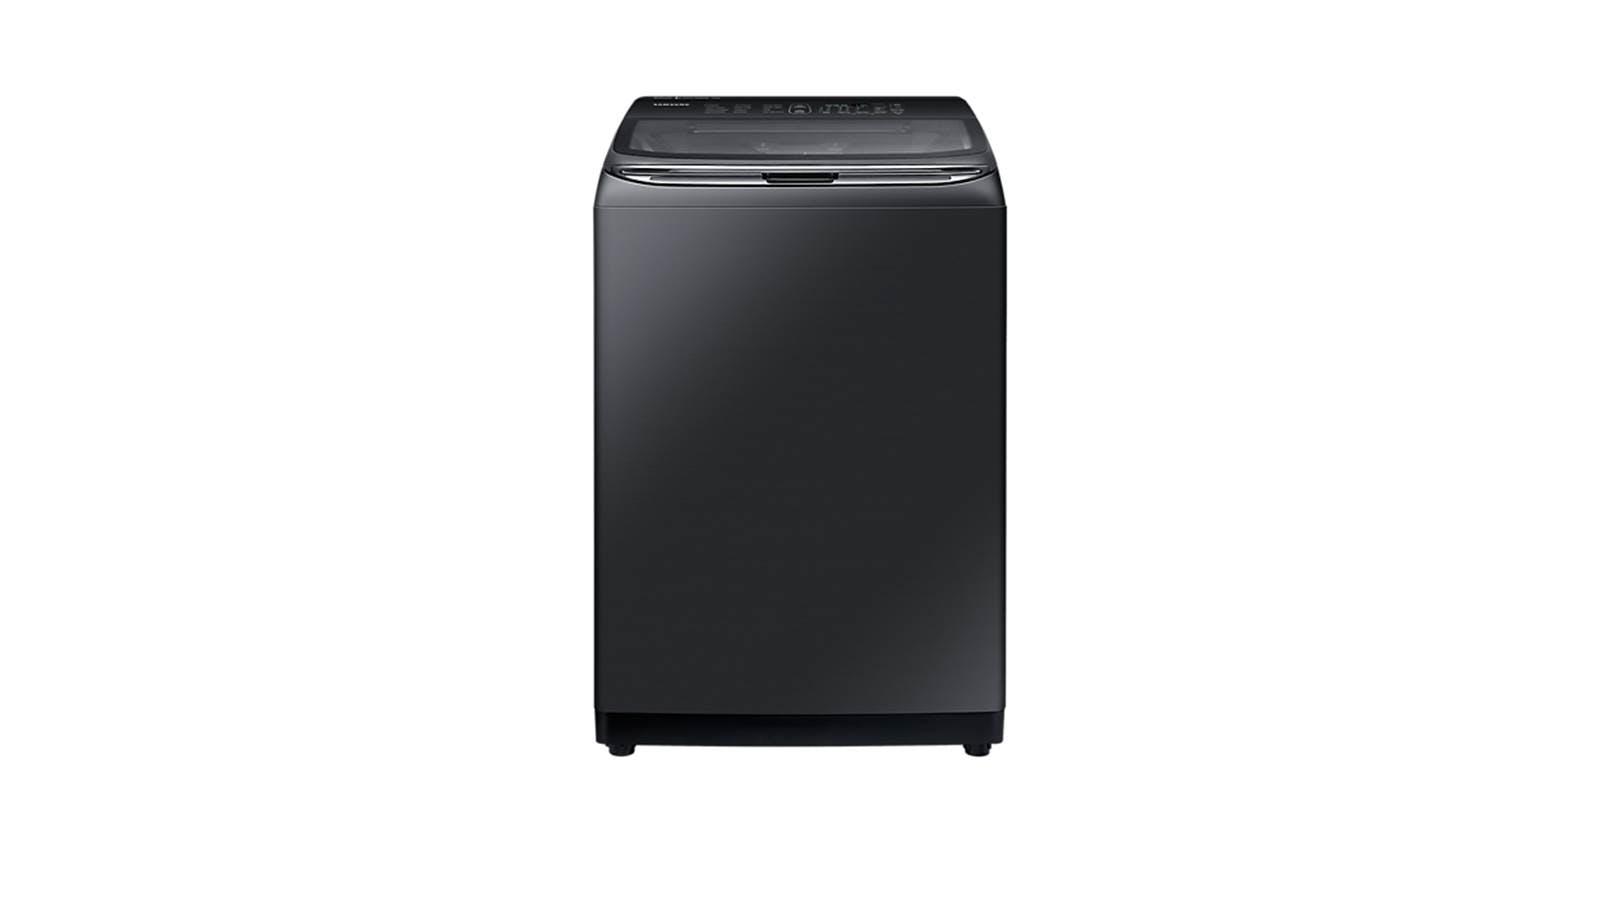 Samsung Wa 18m8700gv 18kg Top Load Washer Harvey Norman